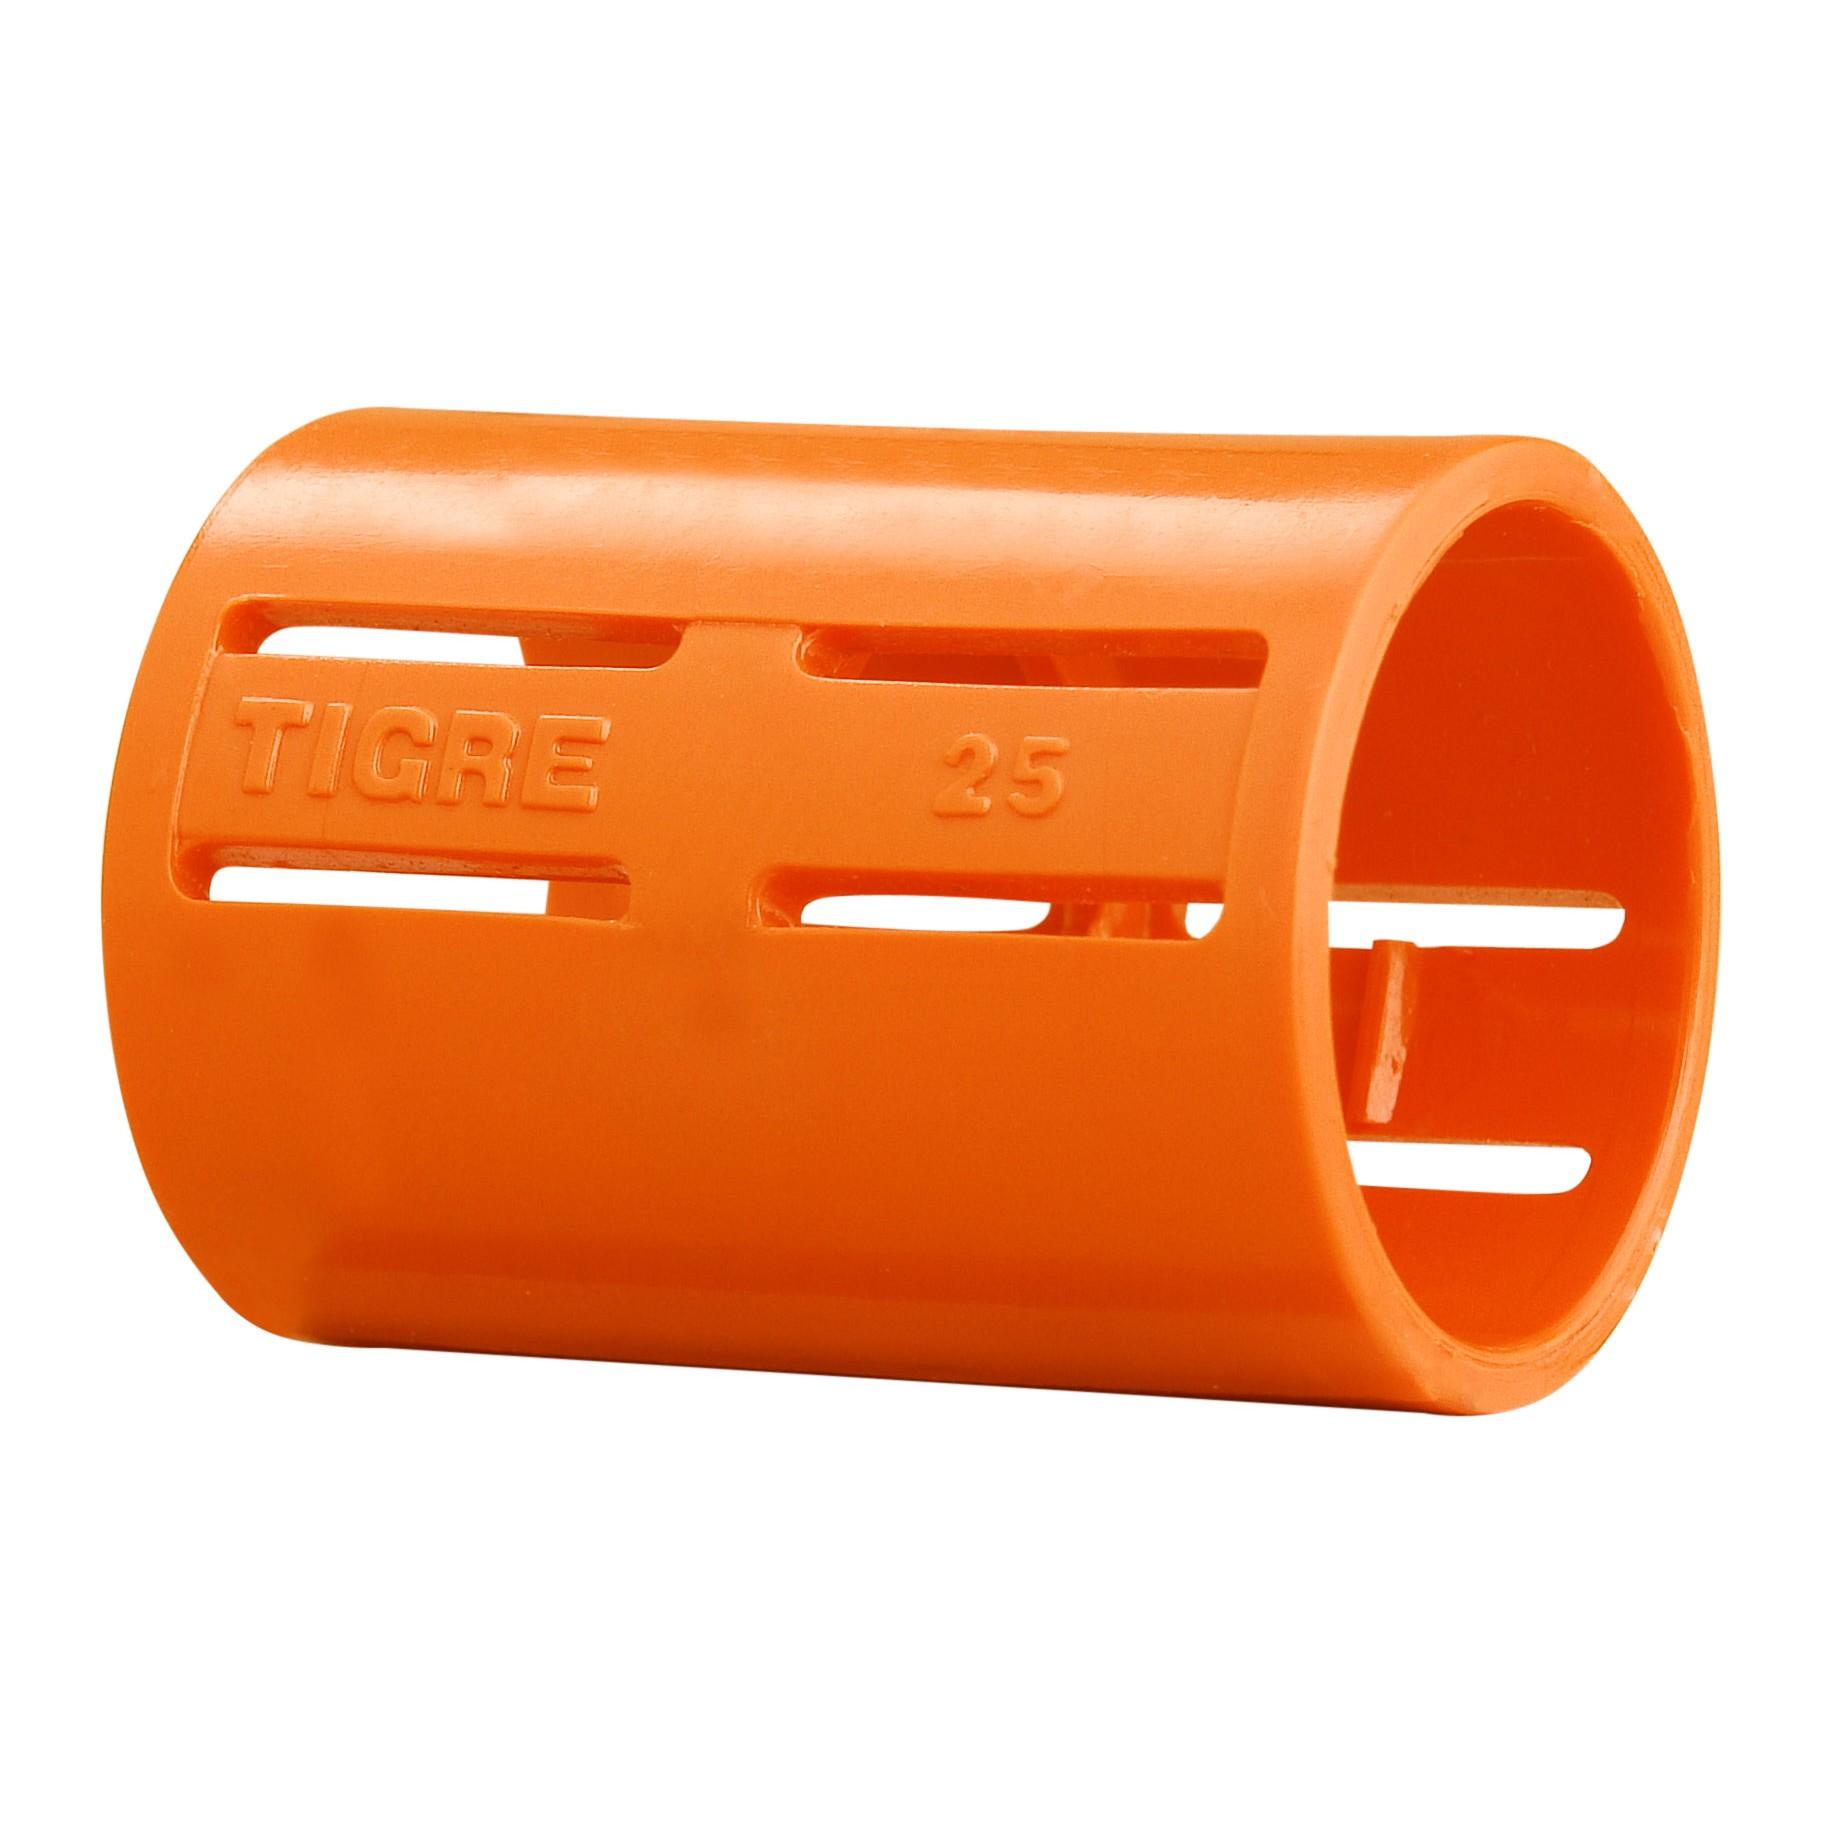 Luva Pressao 34 PVC Antichamas Laranja - Tigre